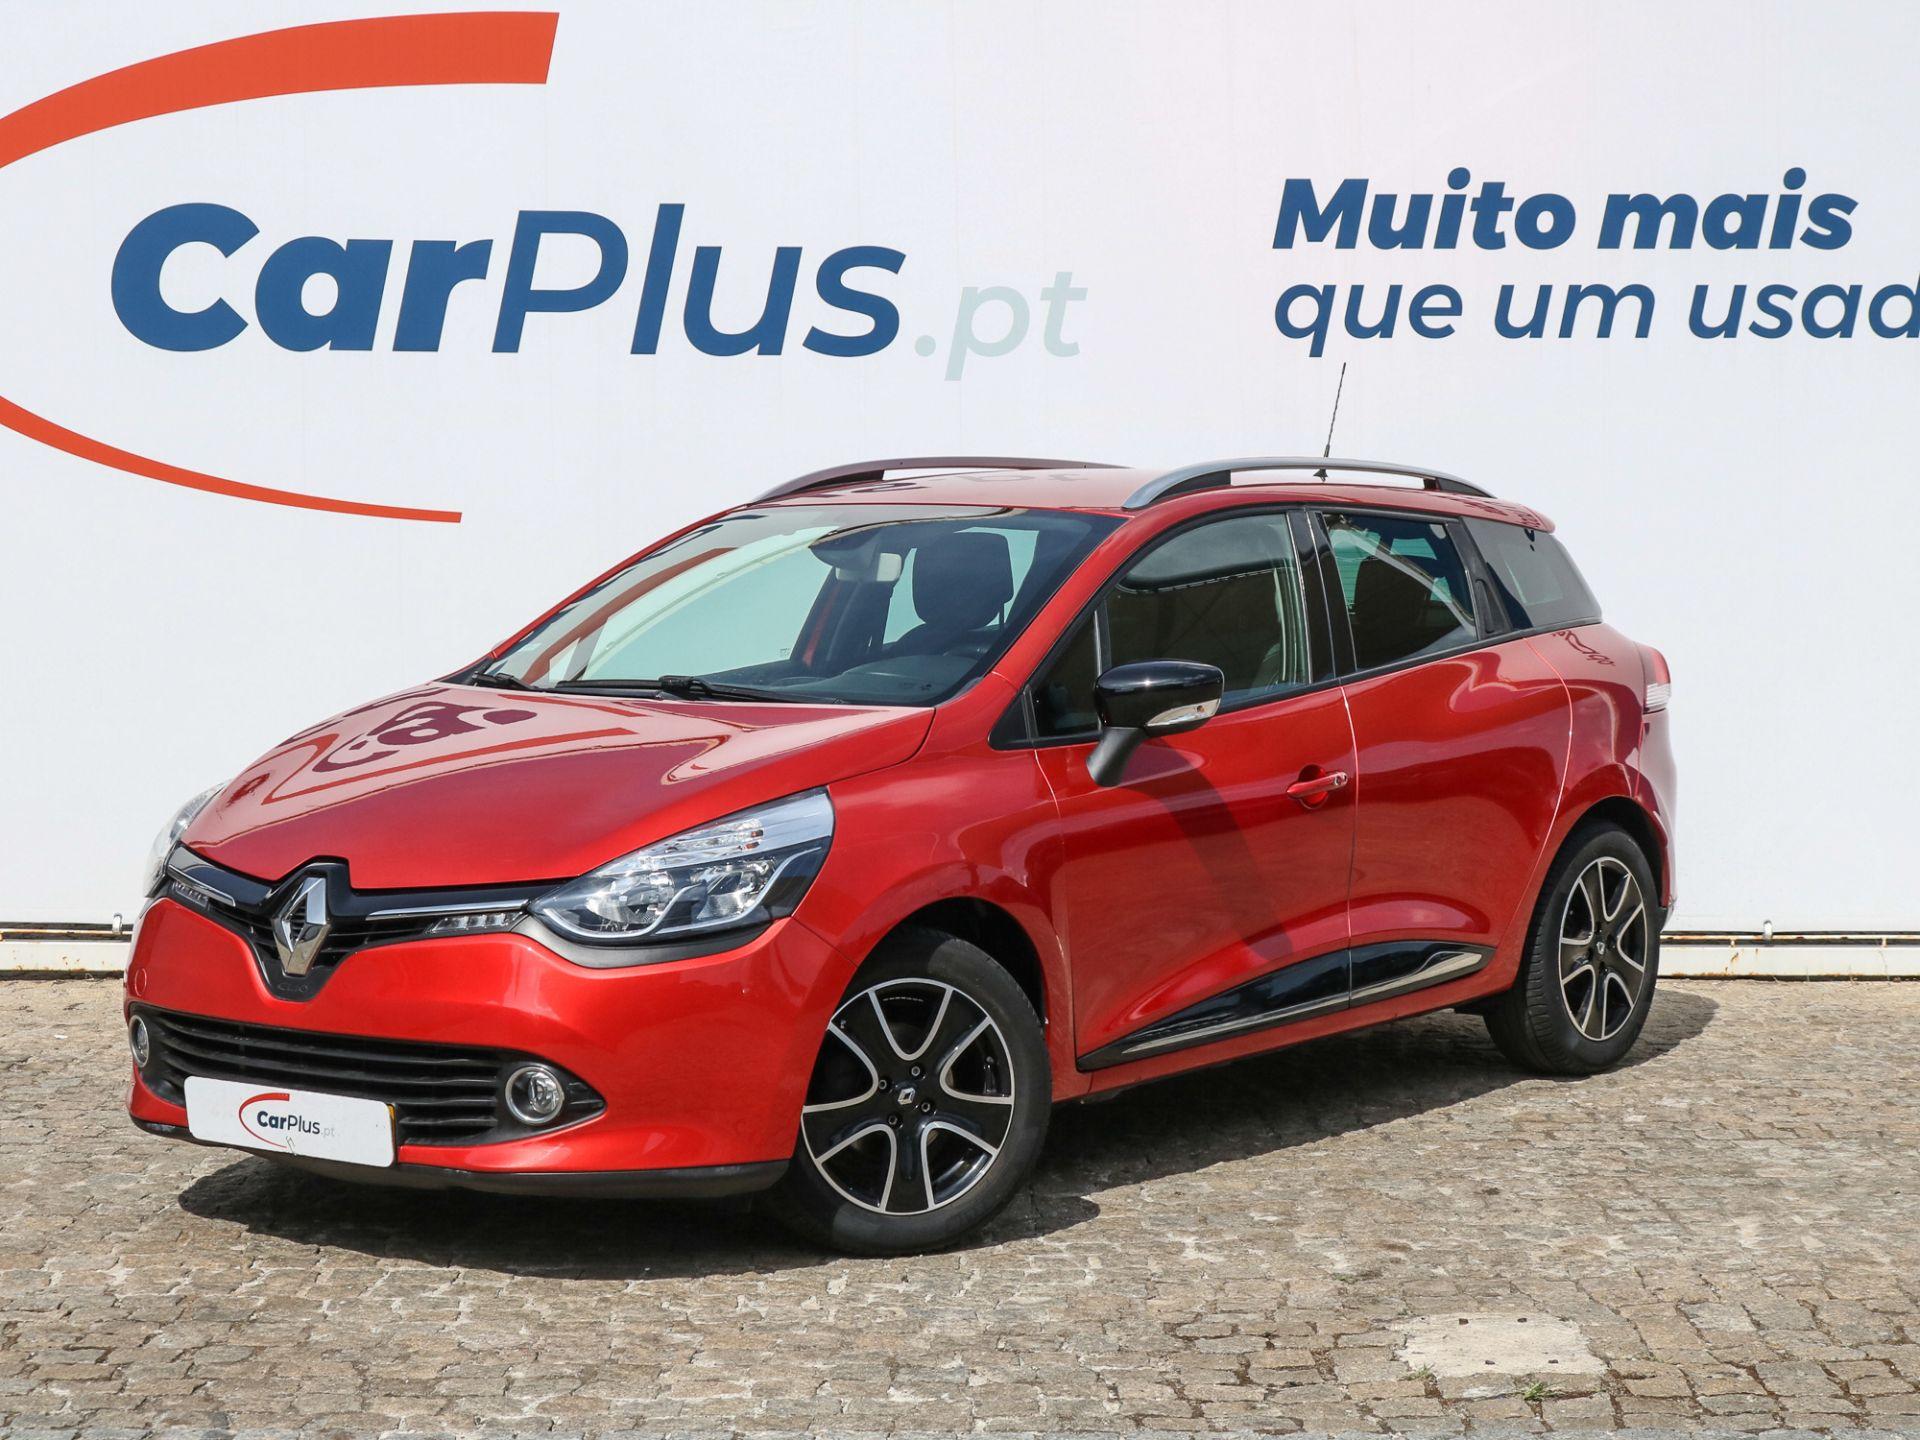 Renault Clio ST 0.9 Energy TCe 90cv S&S ECO2 Luxe segunda mão Lisboa